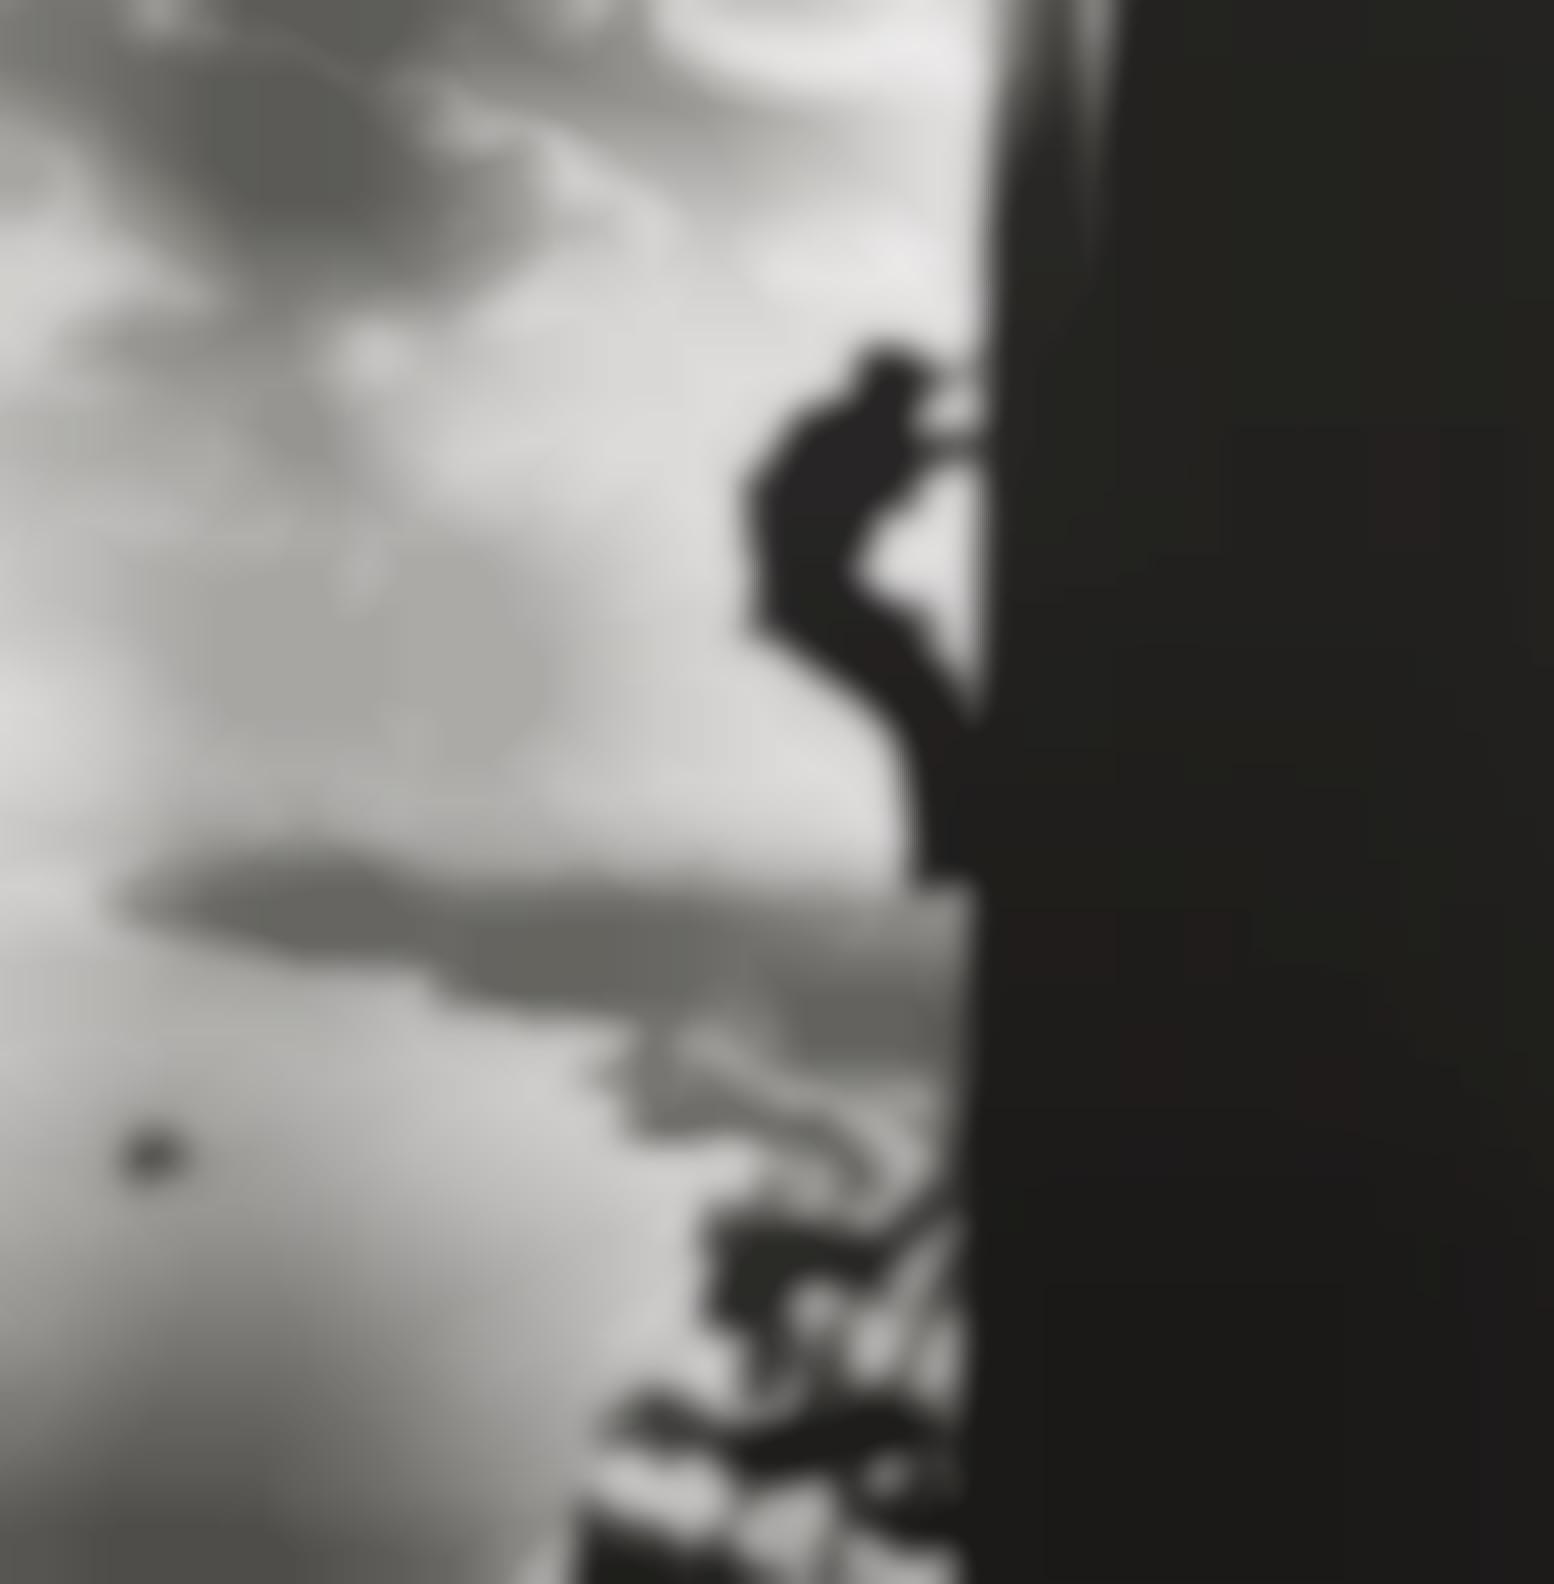 Bedrich Grunzweig - Between Heaven And Earth: Window-Washer Of The Un, 1950-1951-1951